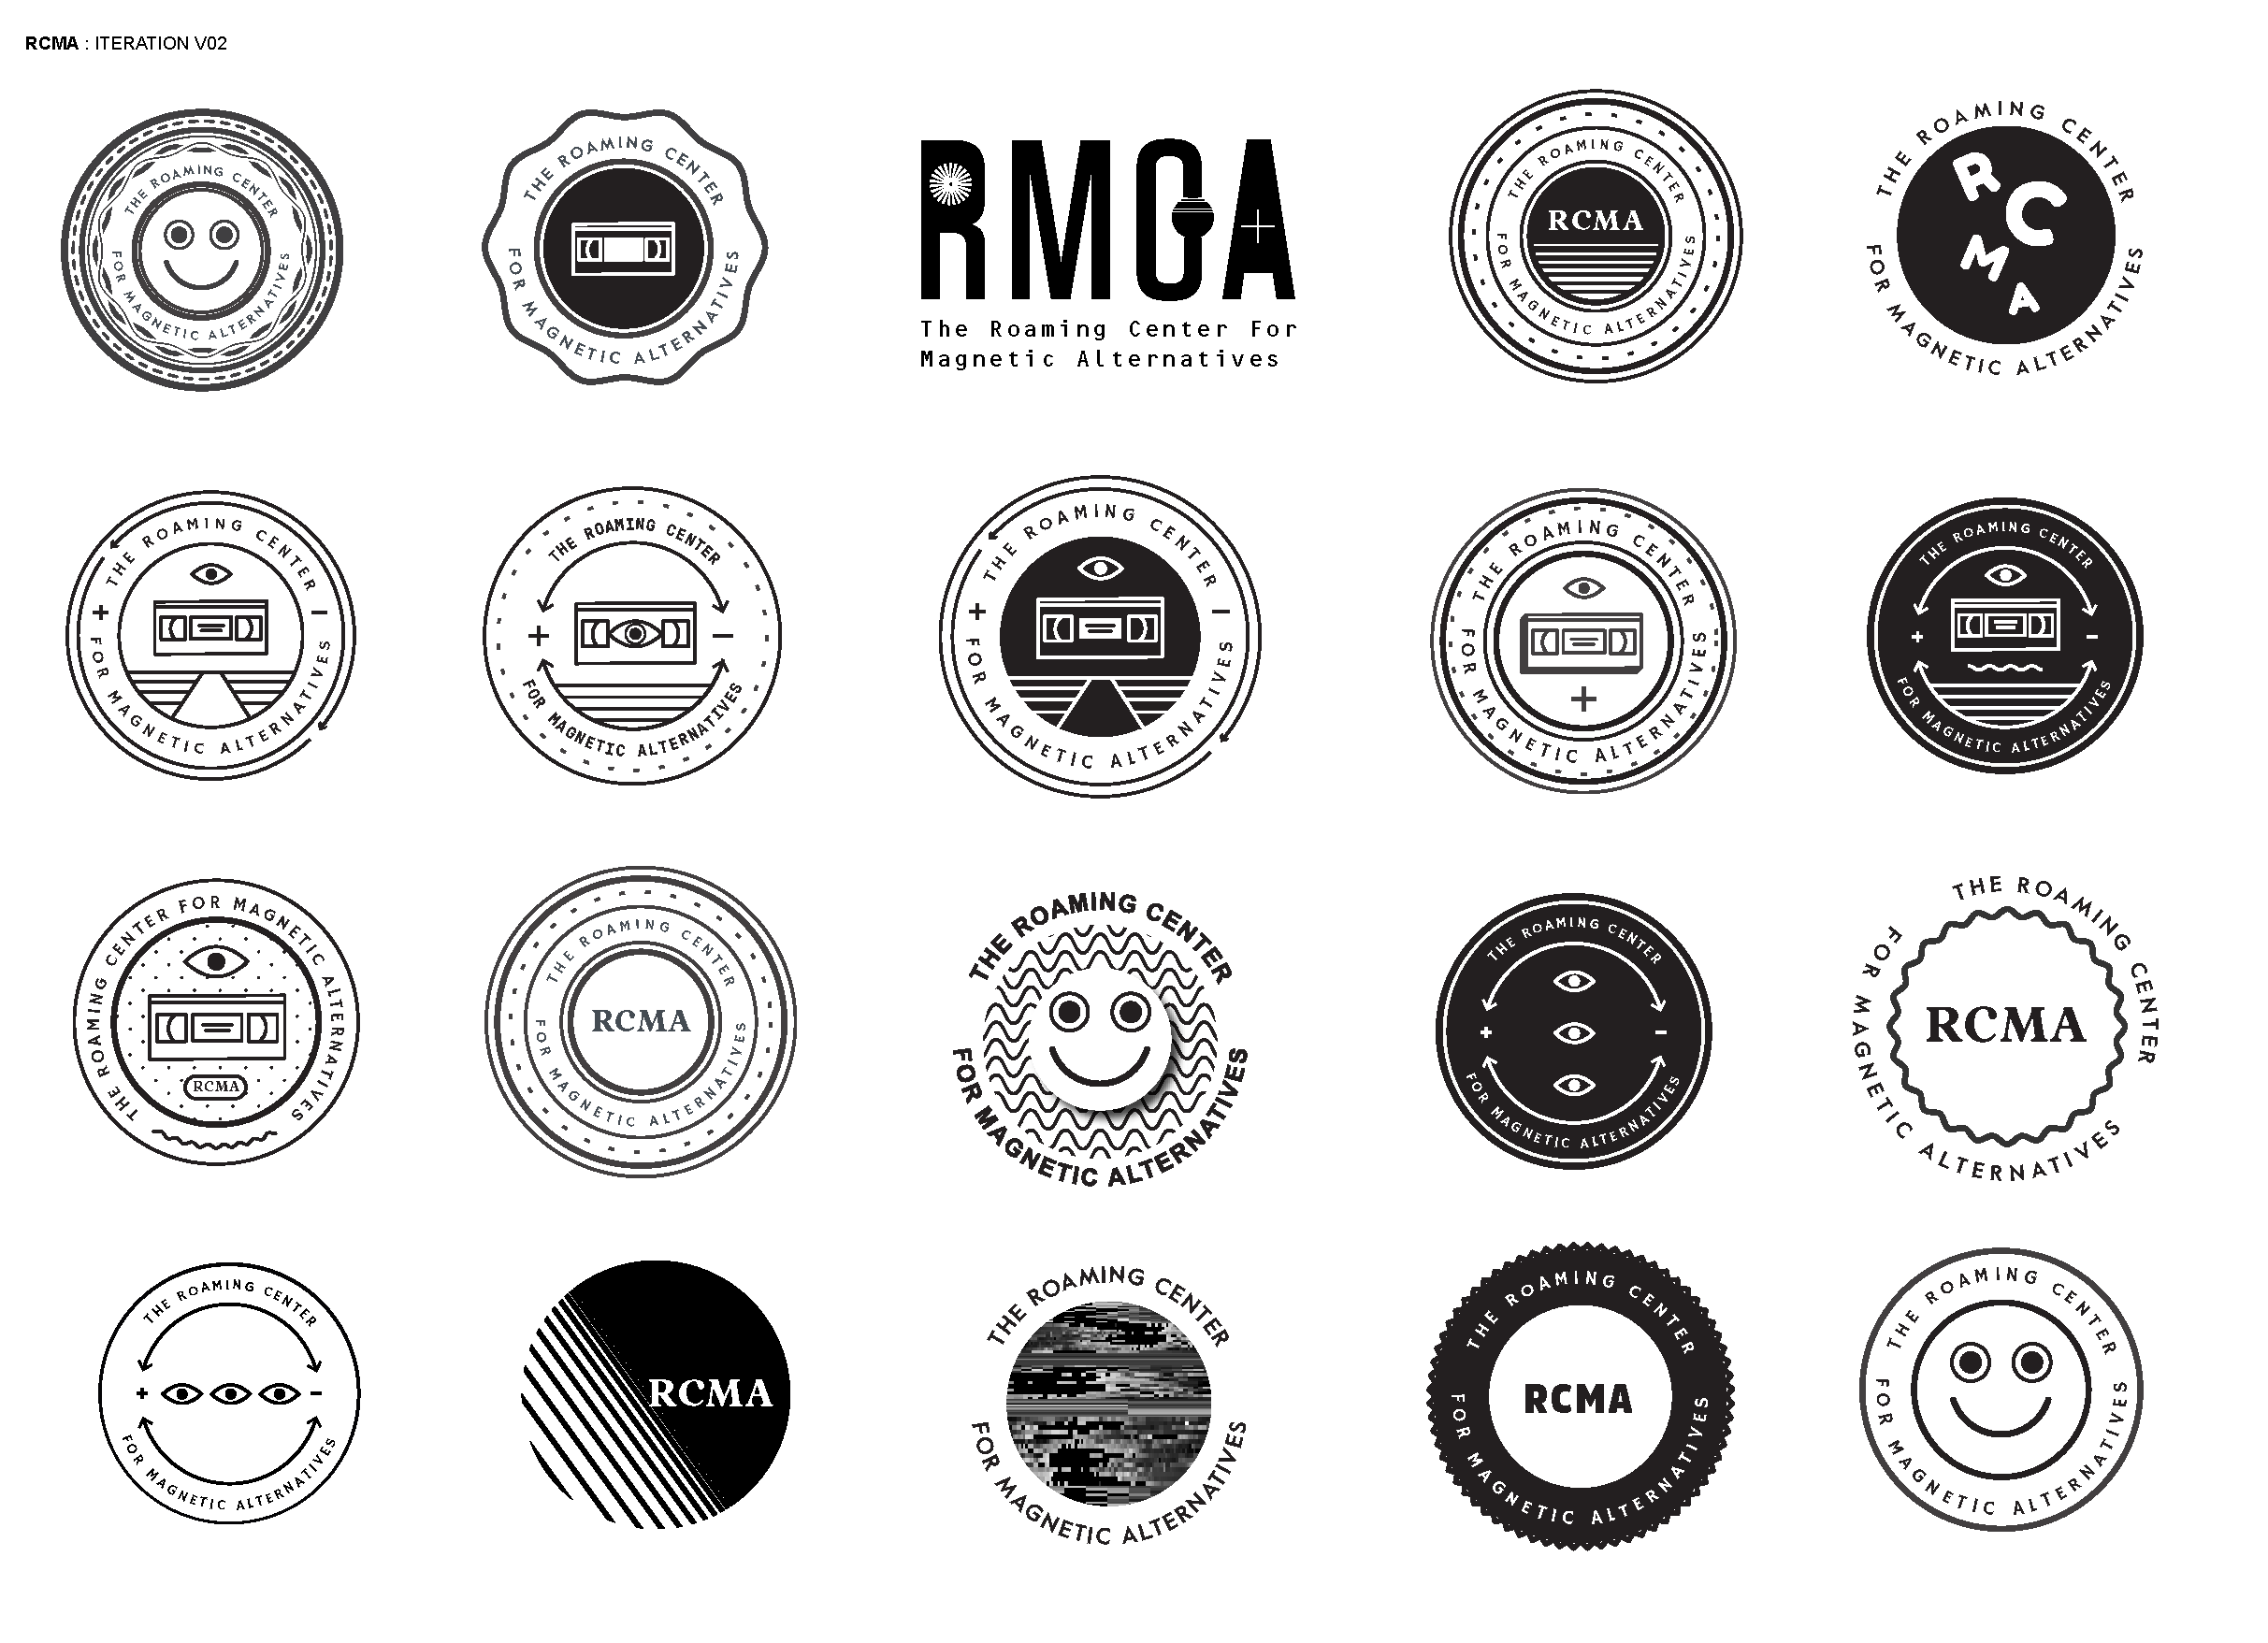 RMCA_Branding_V02.png